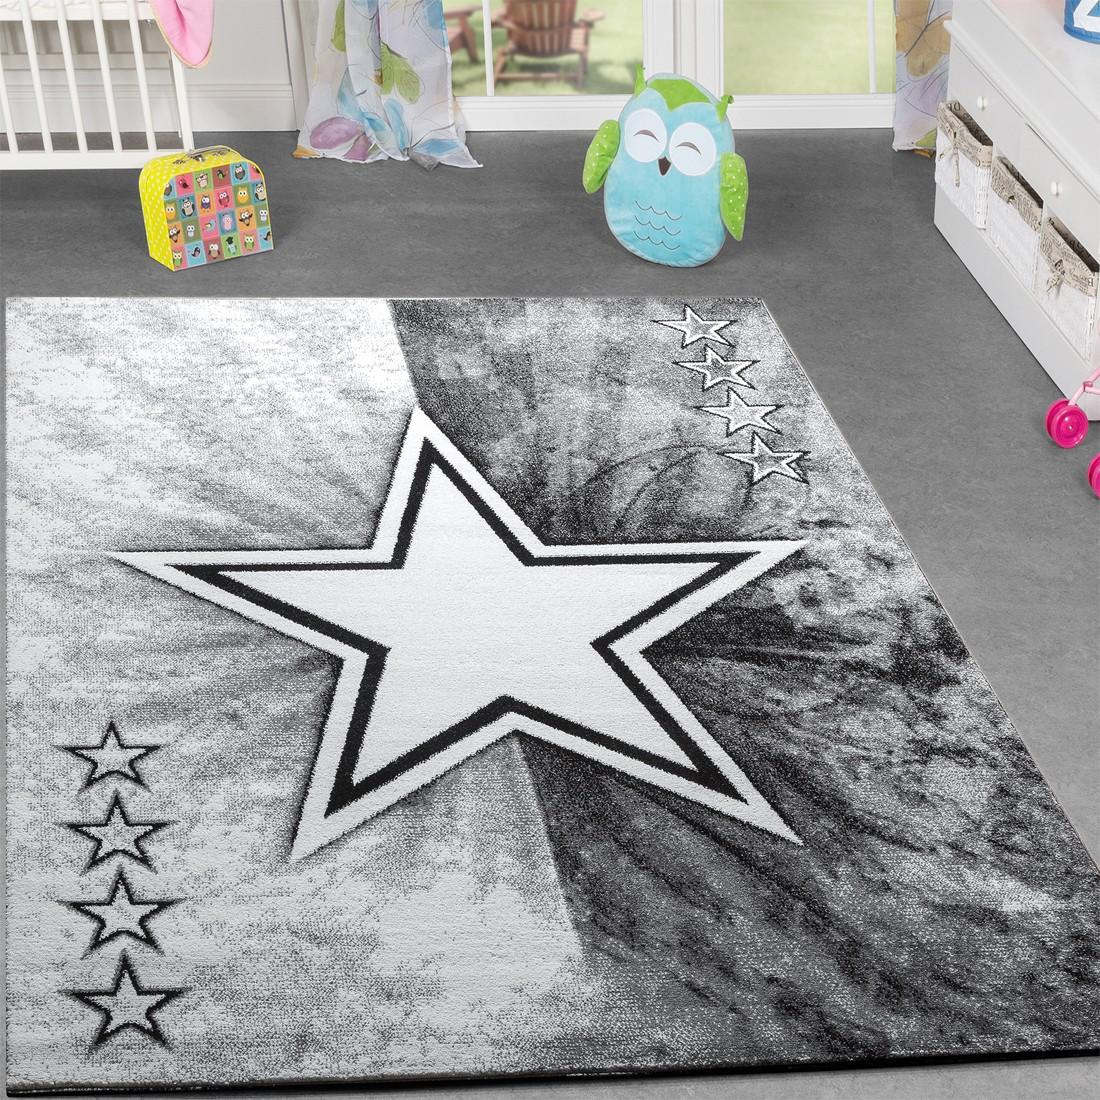 Full Size of Kinderteppiche Modern Kinderzimmer Stern Grau Teppichmax Regal Regale Sofa Wohnzimmer Teppiche Weiß Kinderzimmer Kinderzimmer Teppiche